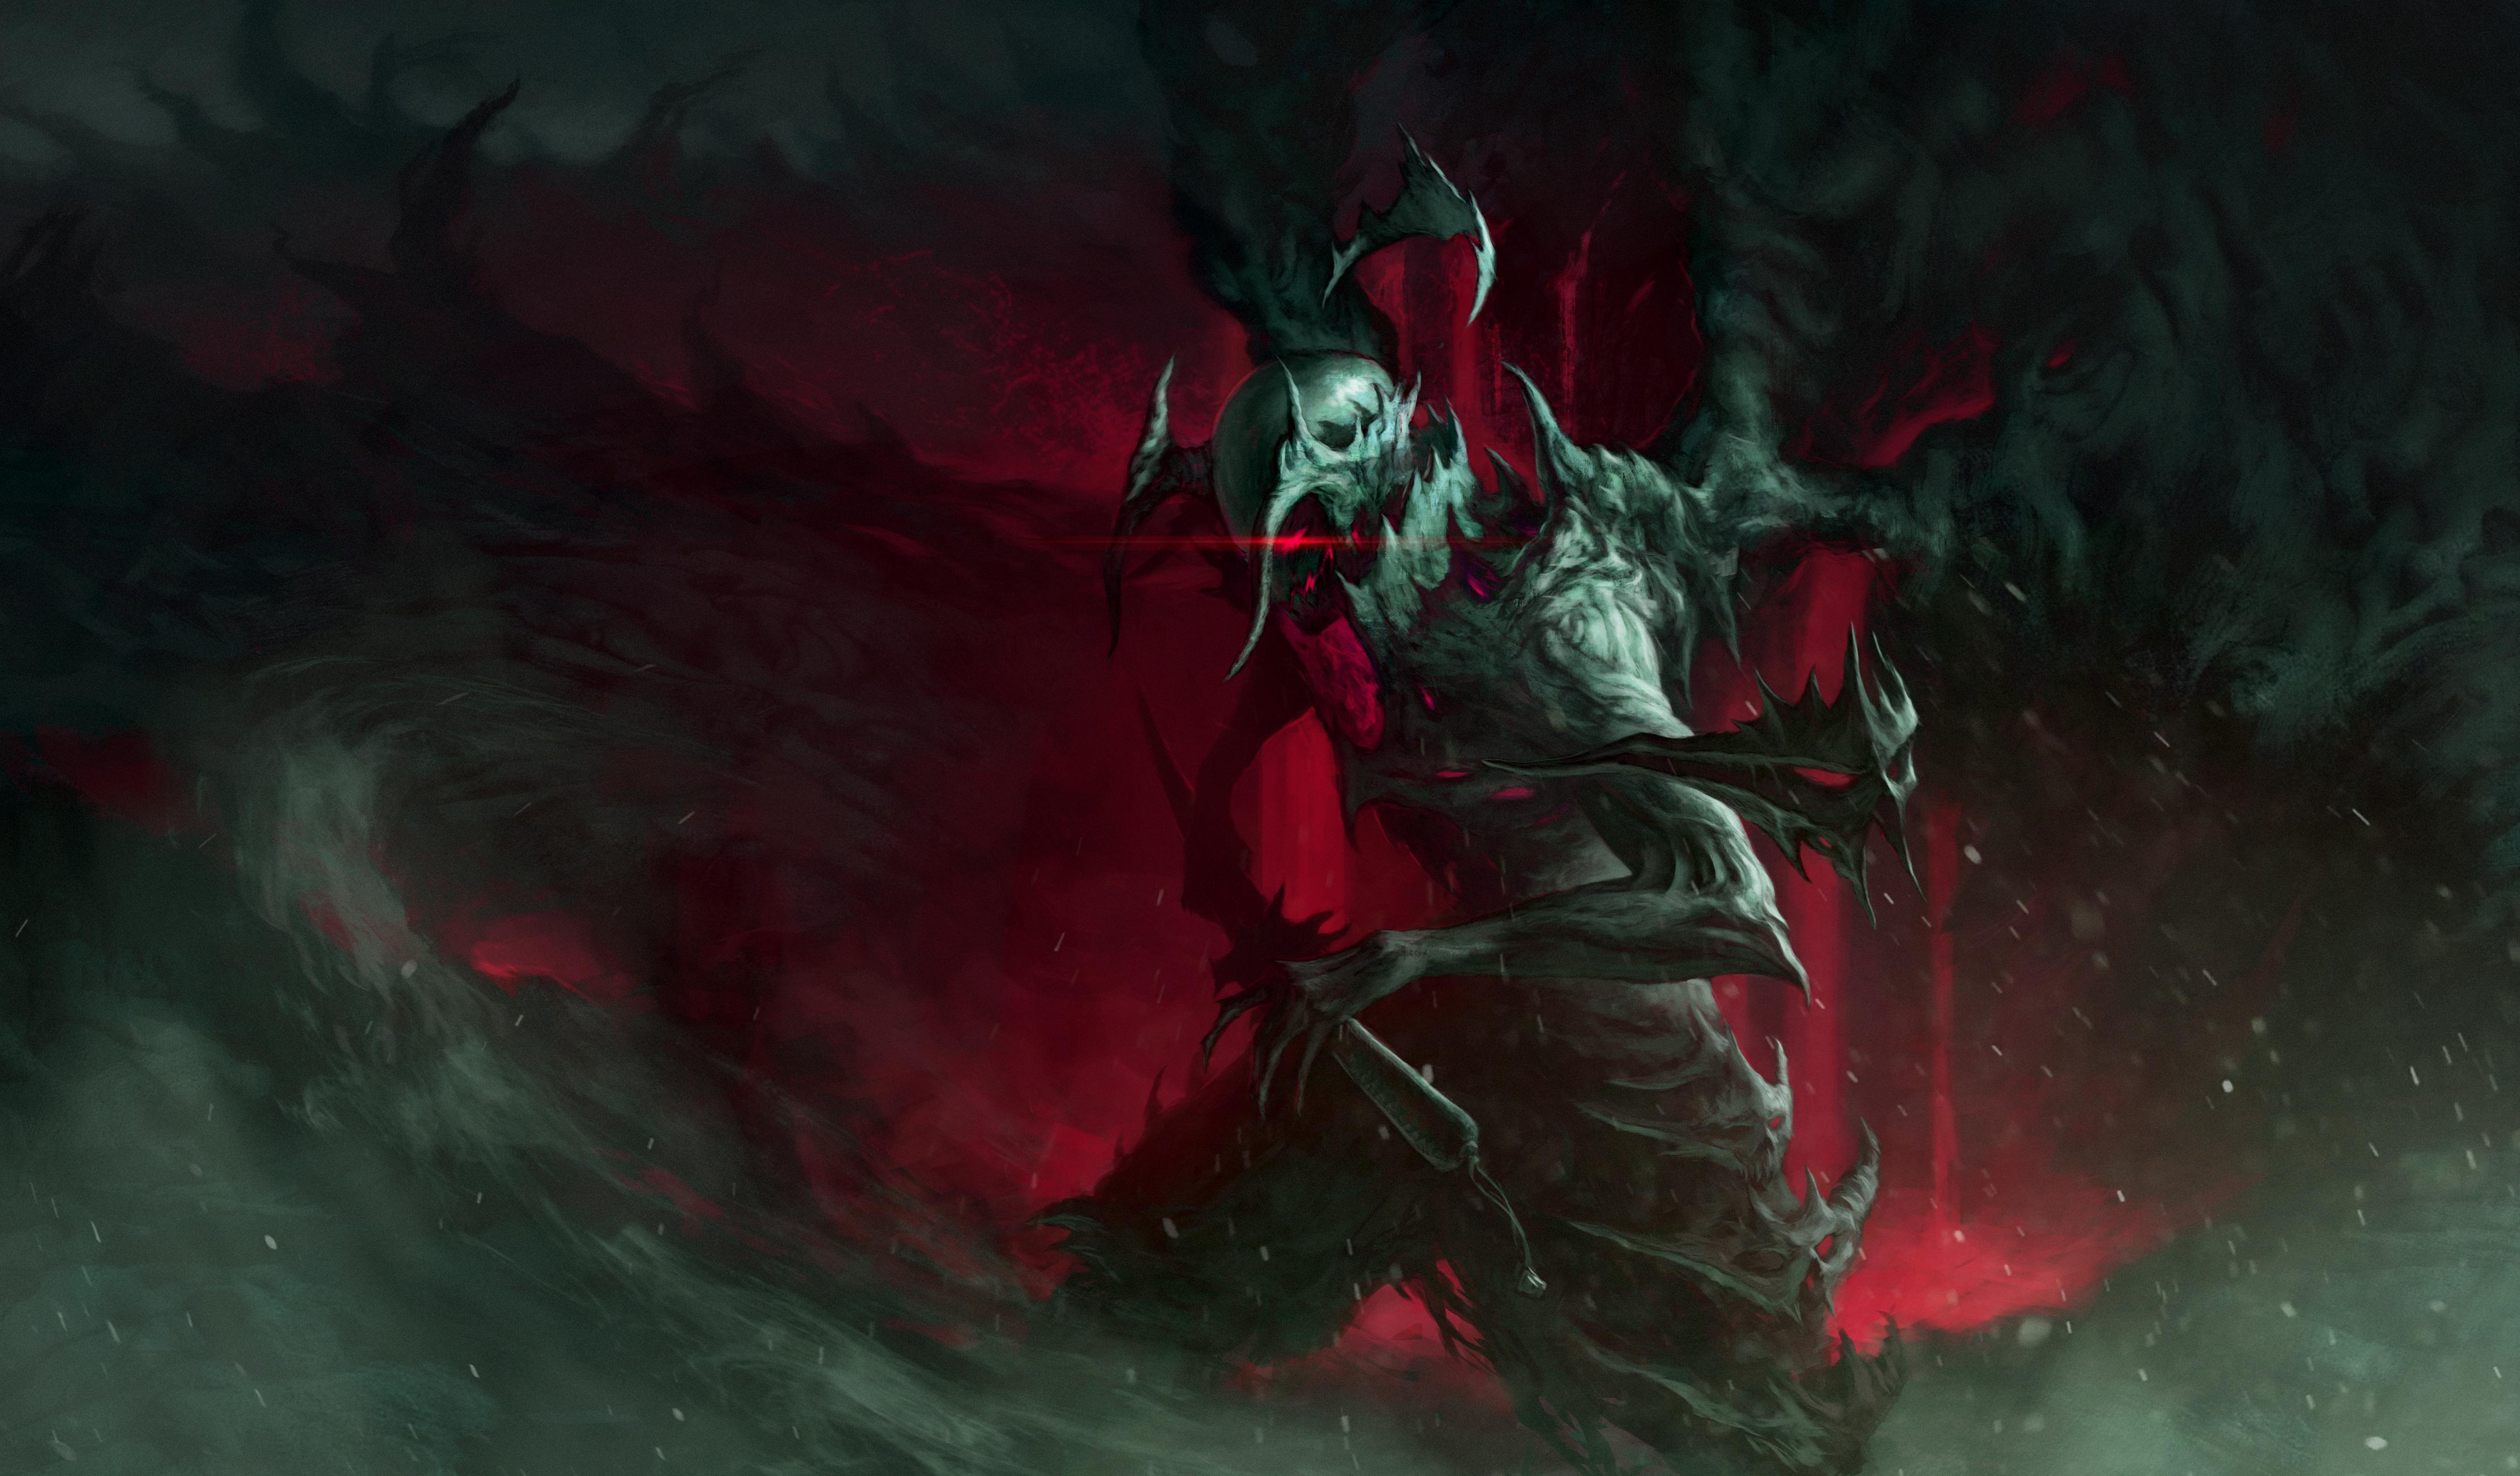 Demon 4k ultra hd wallpaper background image 4451x2607 - Demon wallpaper 4k ...